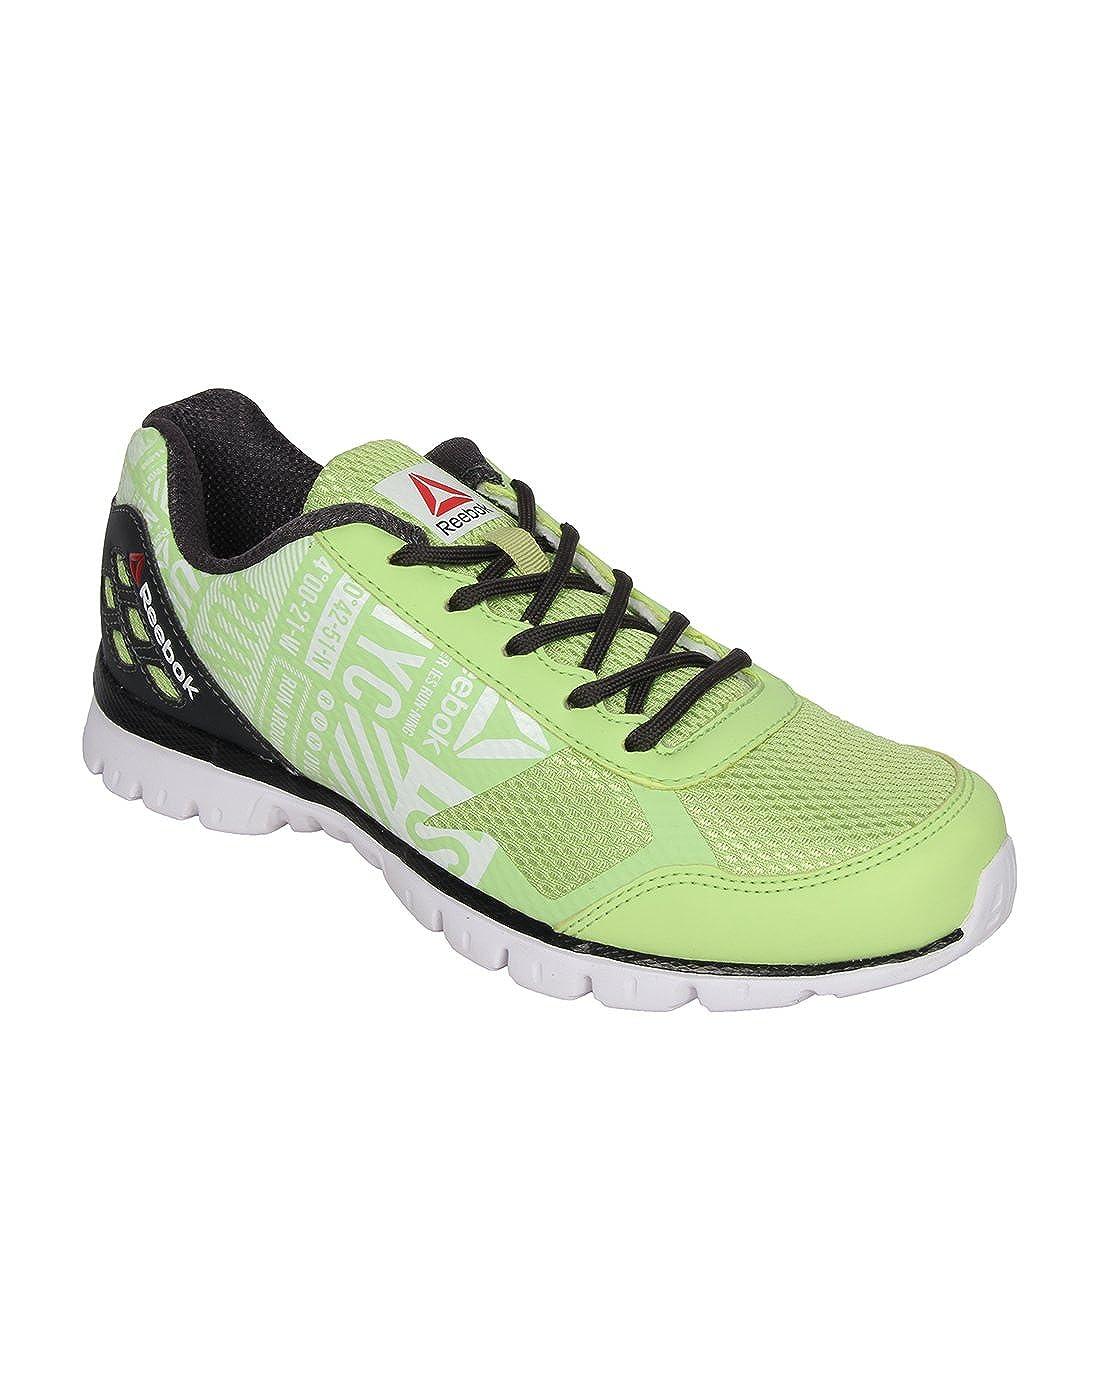 e70a3a75a58c6 Reebok Men s Lime Gravel Running Shoes - 6 UK India (39 EU)(8.5 US)   Amazon.co.uk  Shoes   Bags